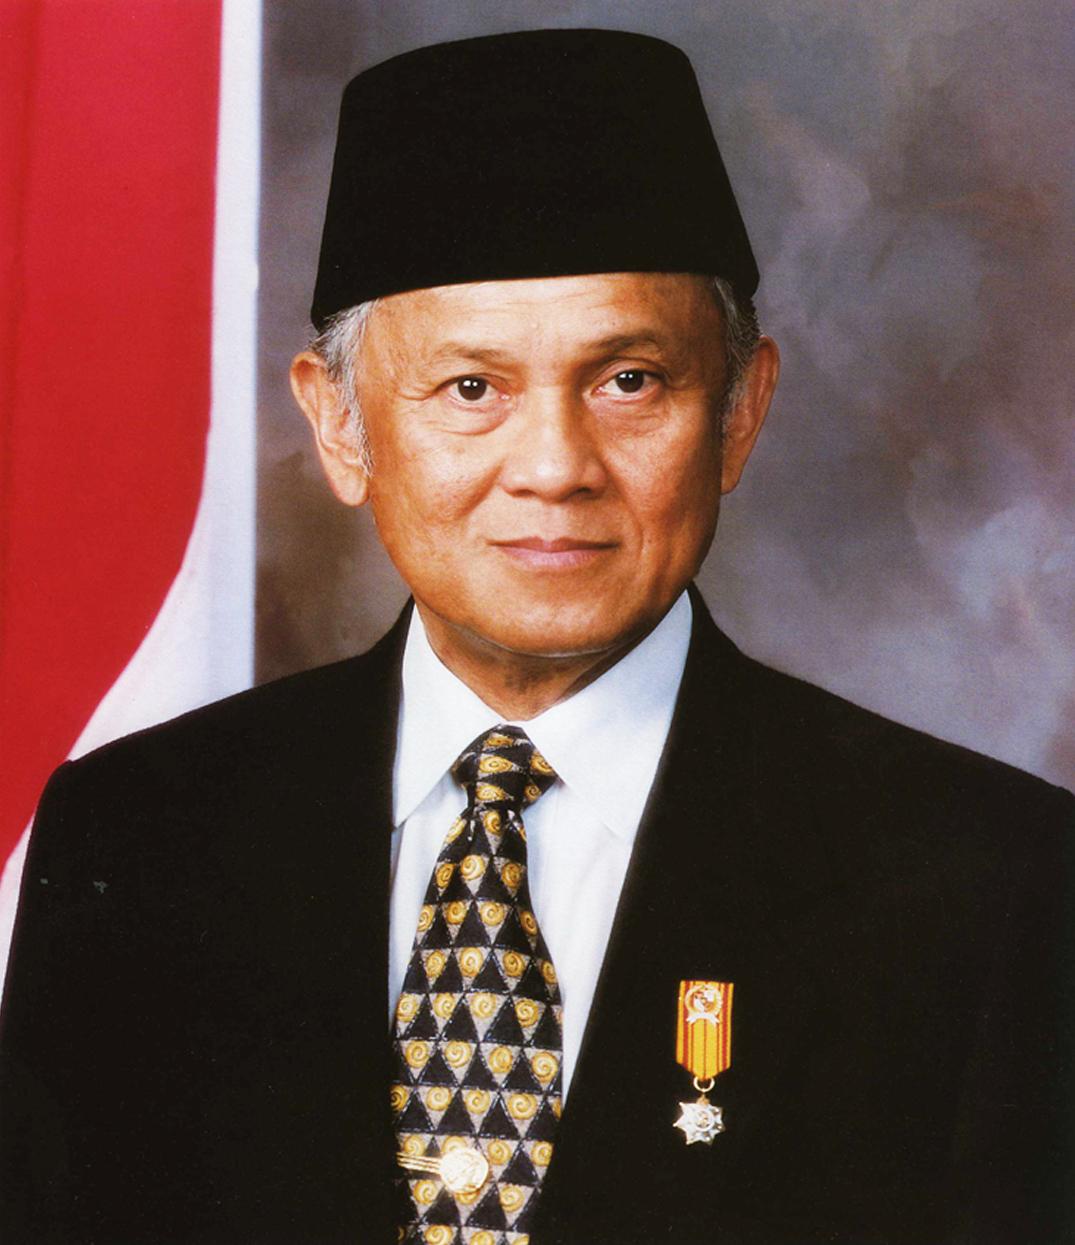 Presiden B.J. Habibie berwarna